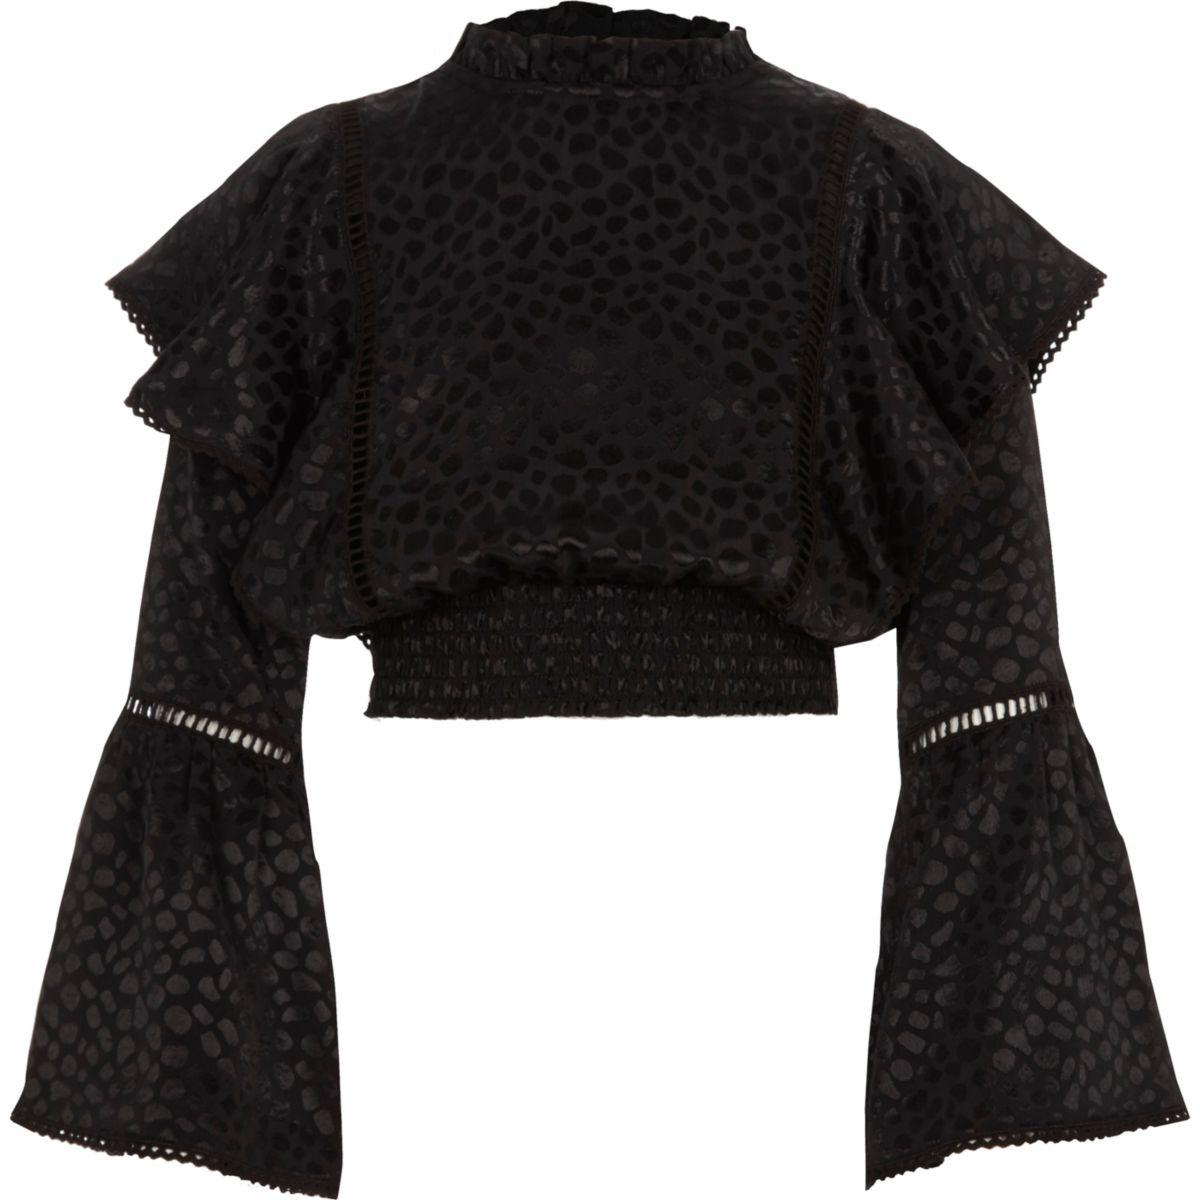 Girls black satin print frill bell sleeve top